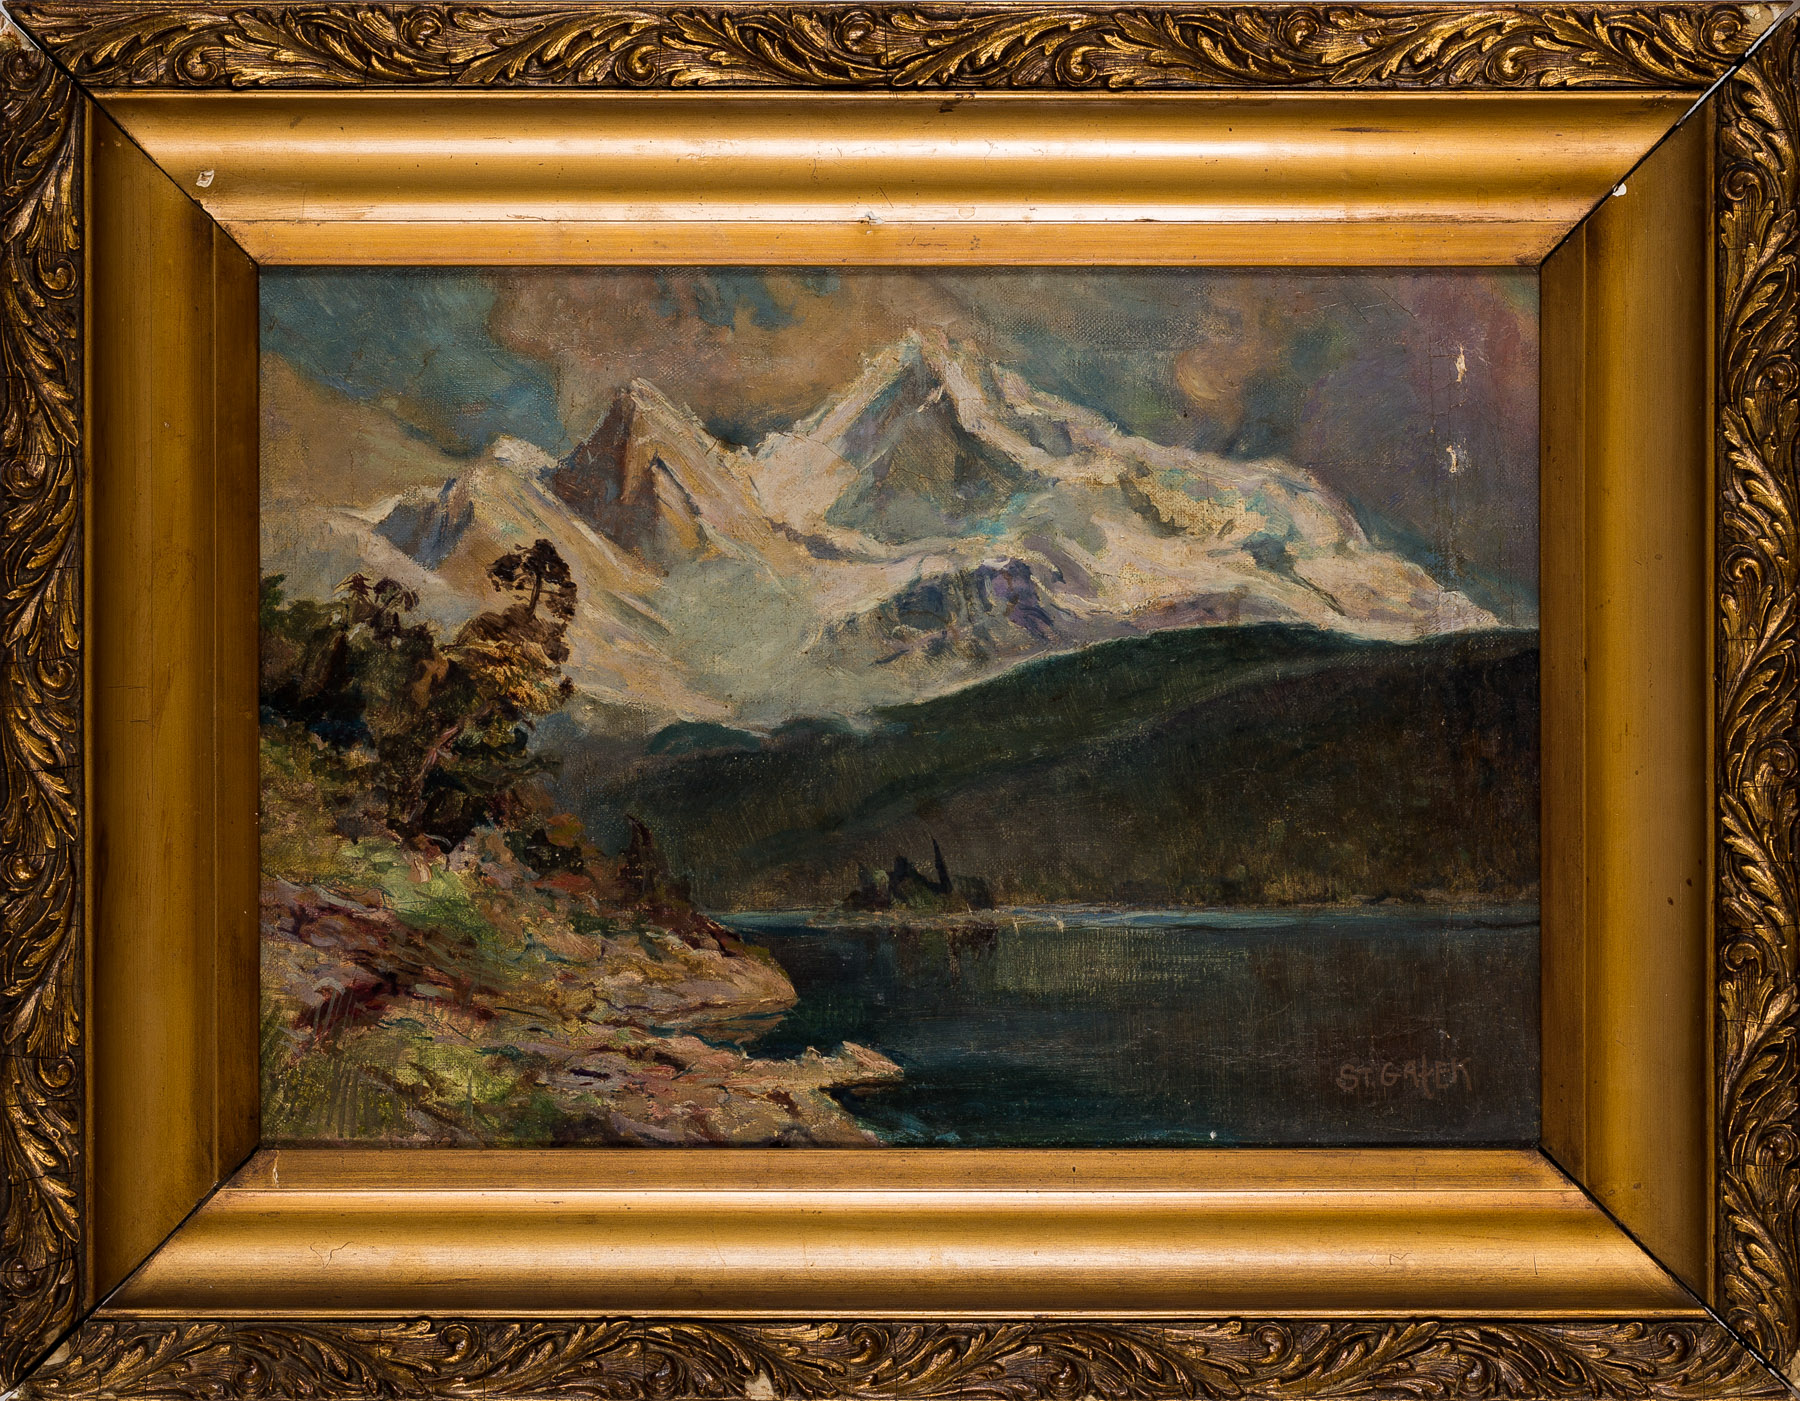 Pejzaż górski, koniec XIX wieku